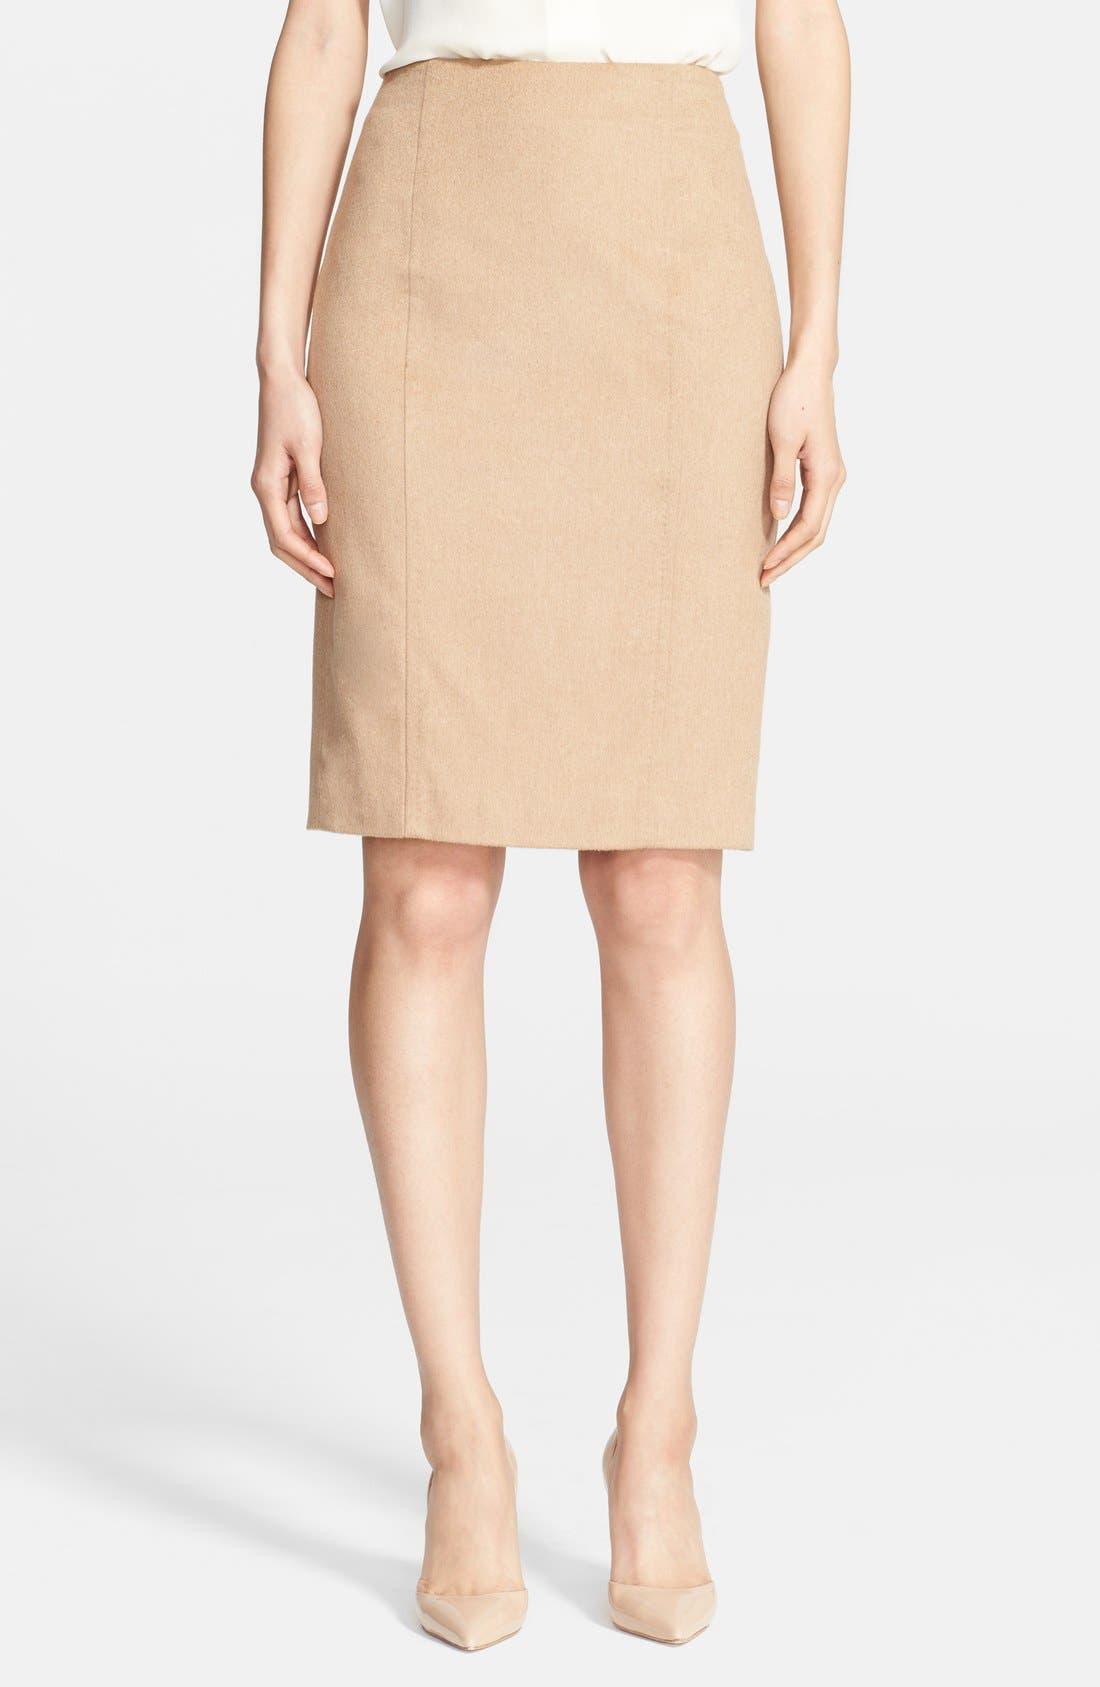 Alternate Image 1 Selected - Max Mara 'Sargano' Camel Hair Pencil Skirt